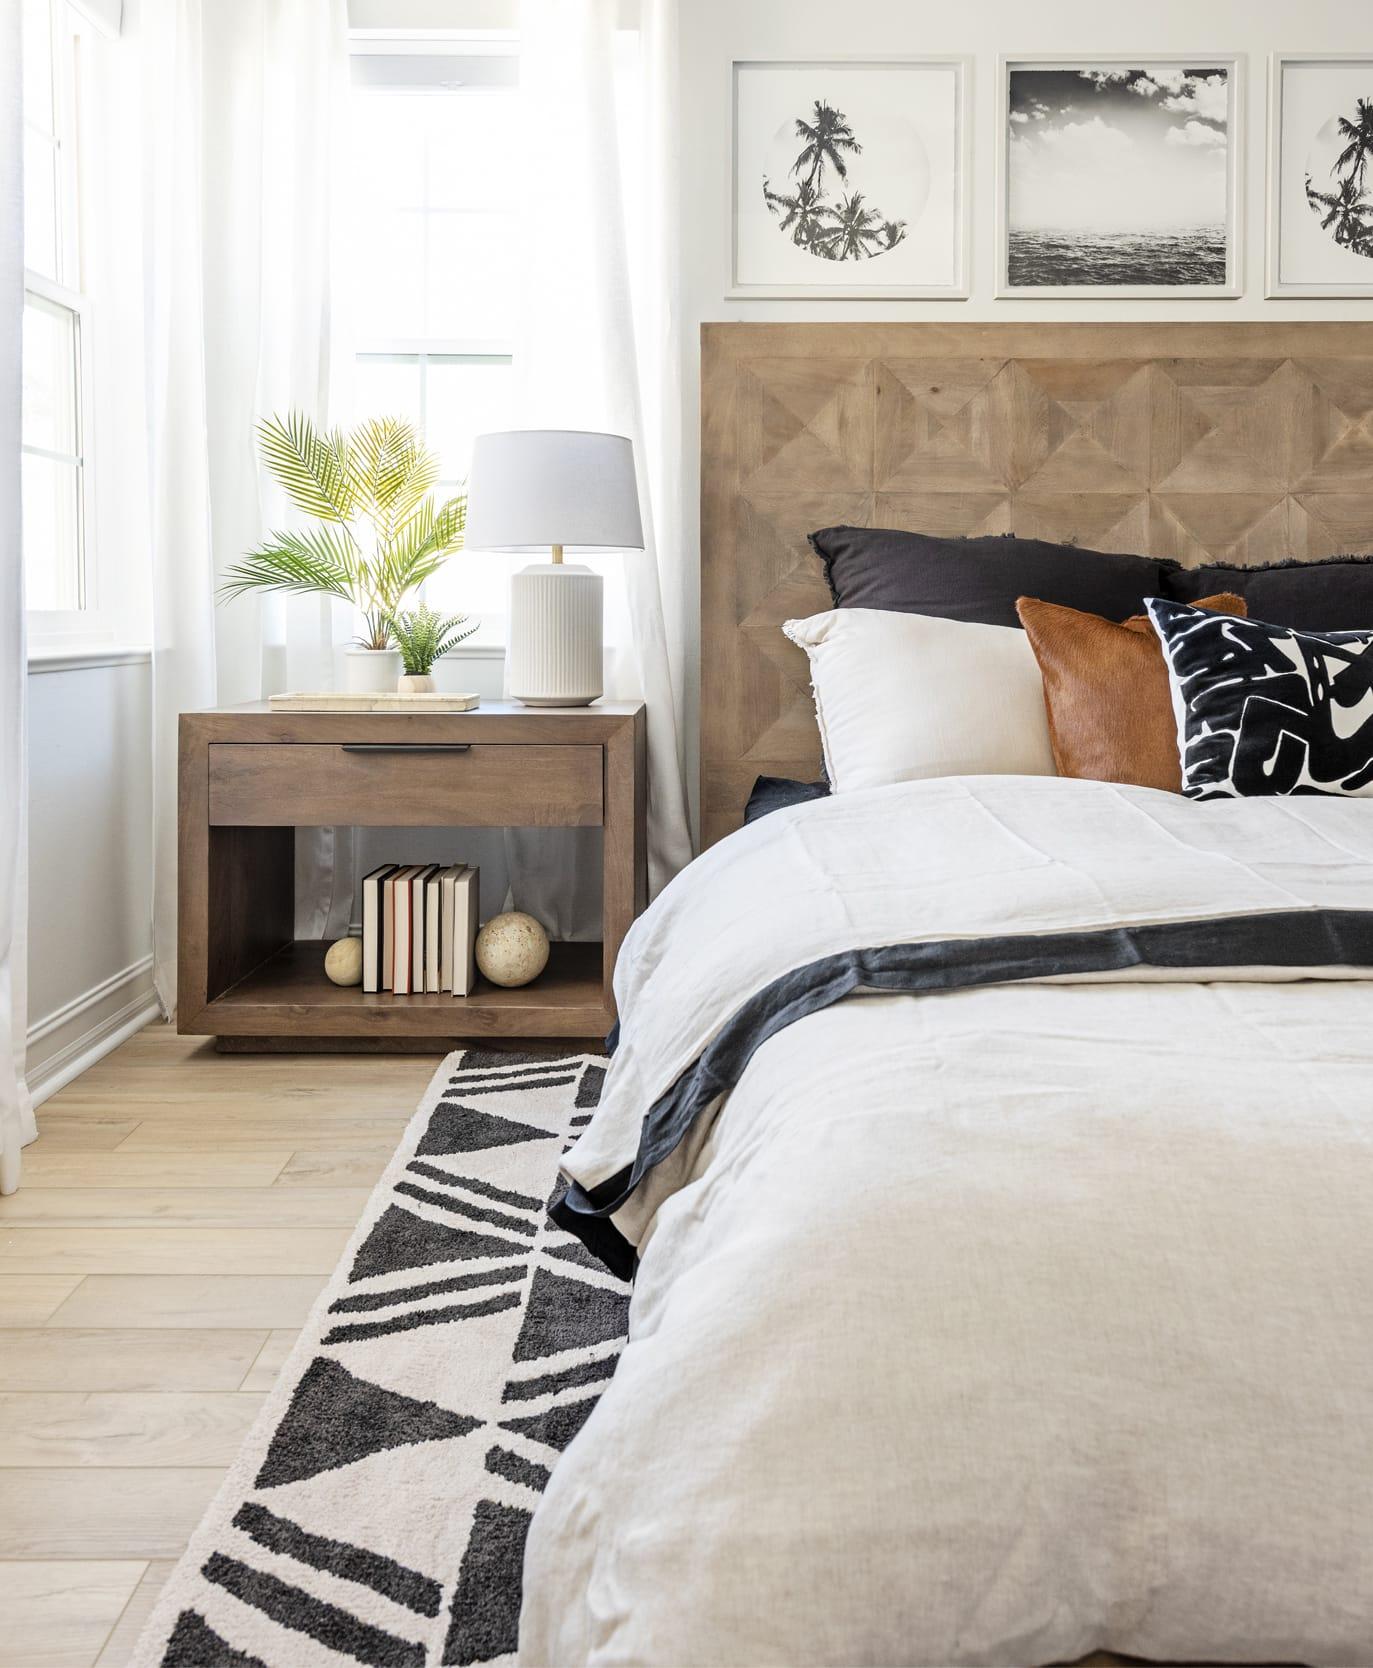 Bedroom Beige Black Bedsheets Rug Pillows Wood Dresser Headboard